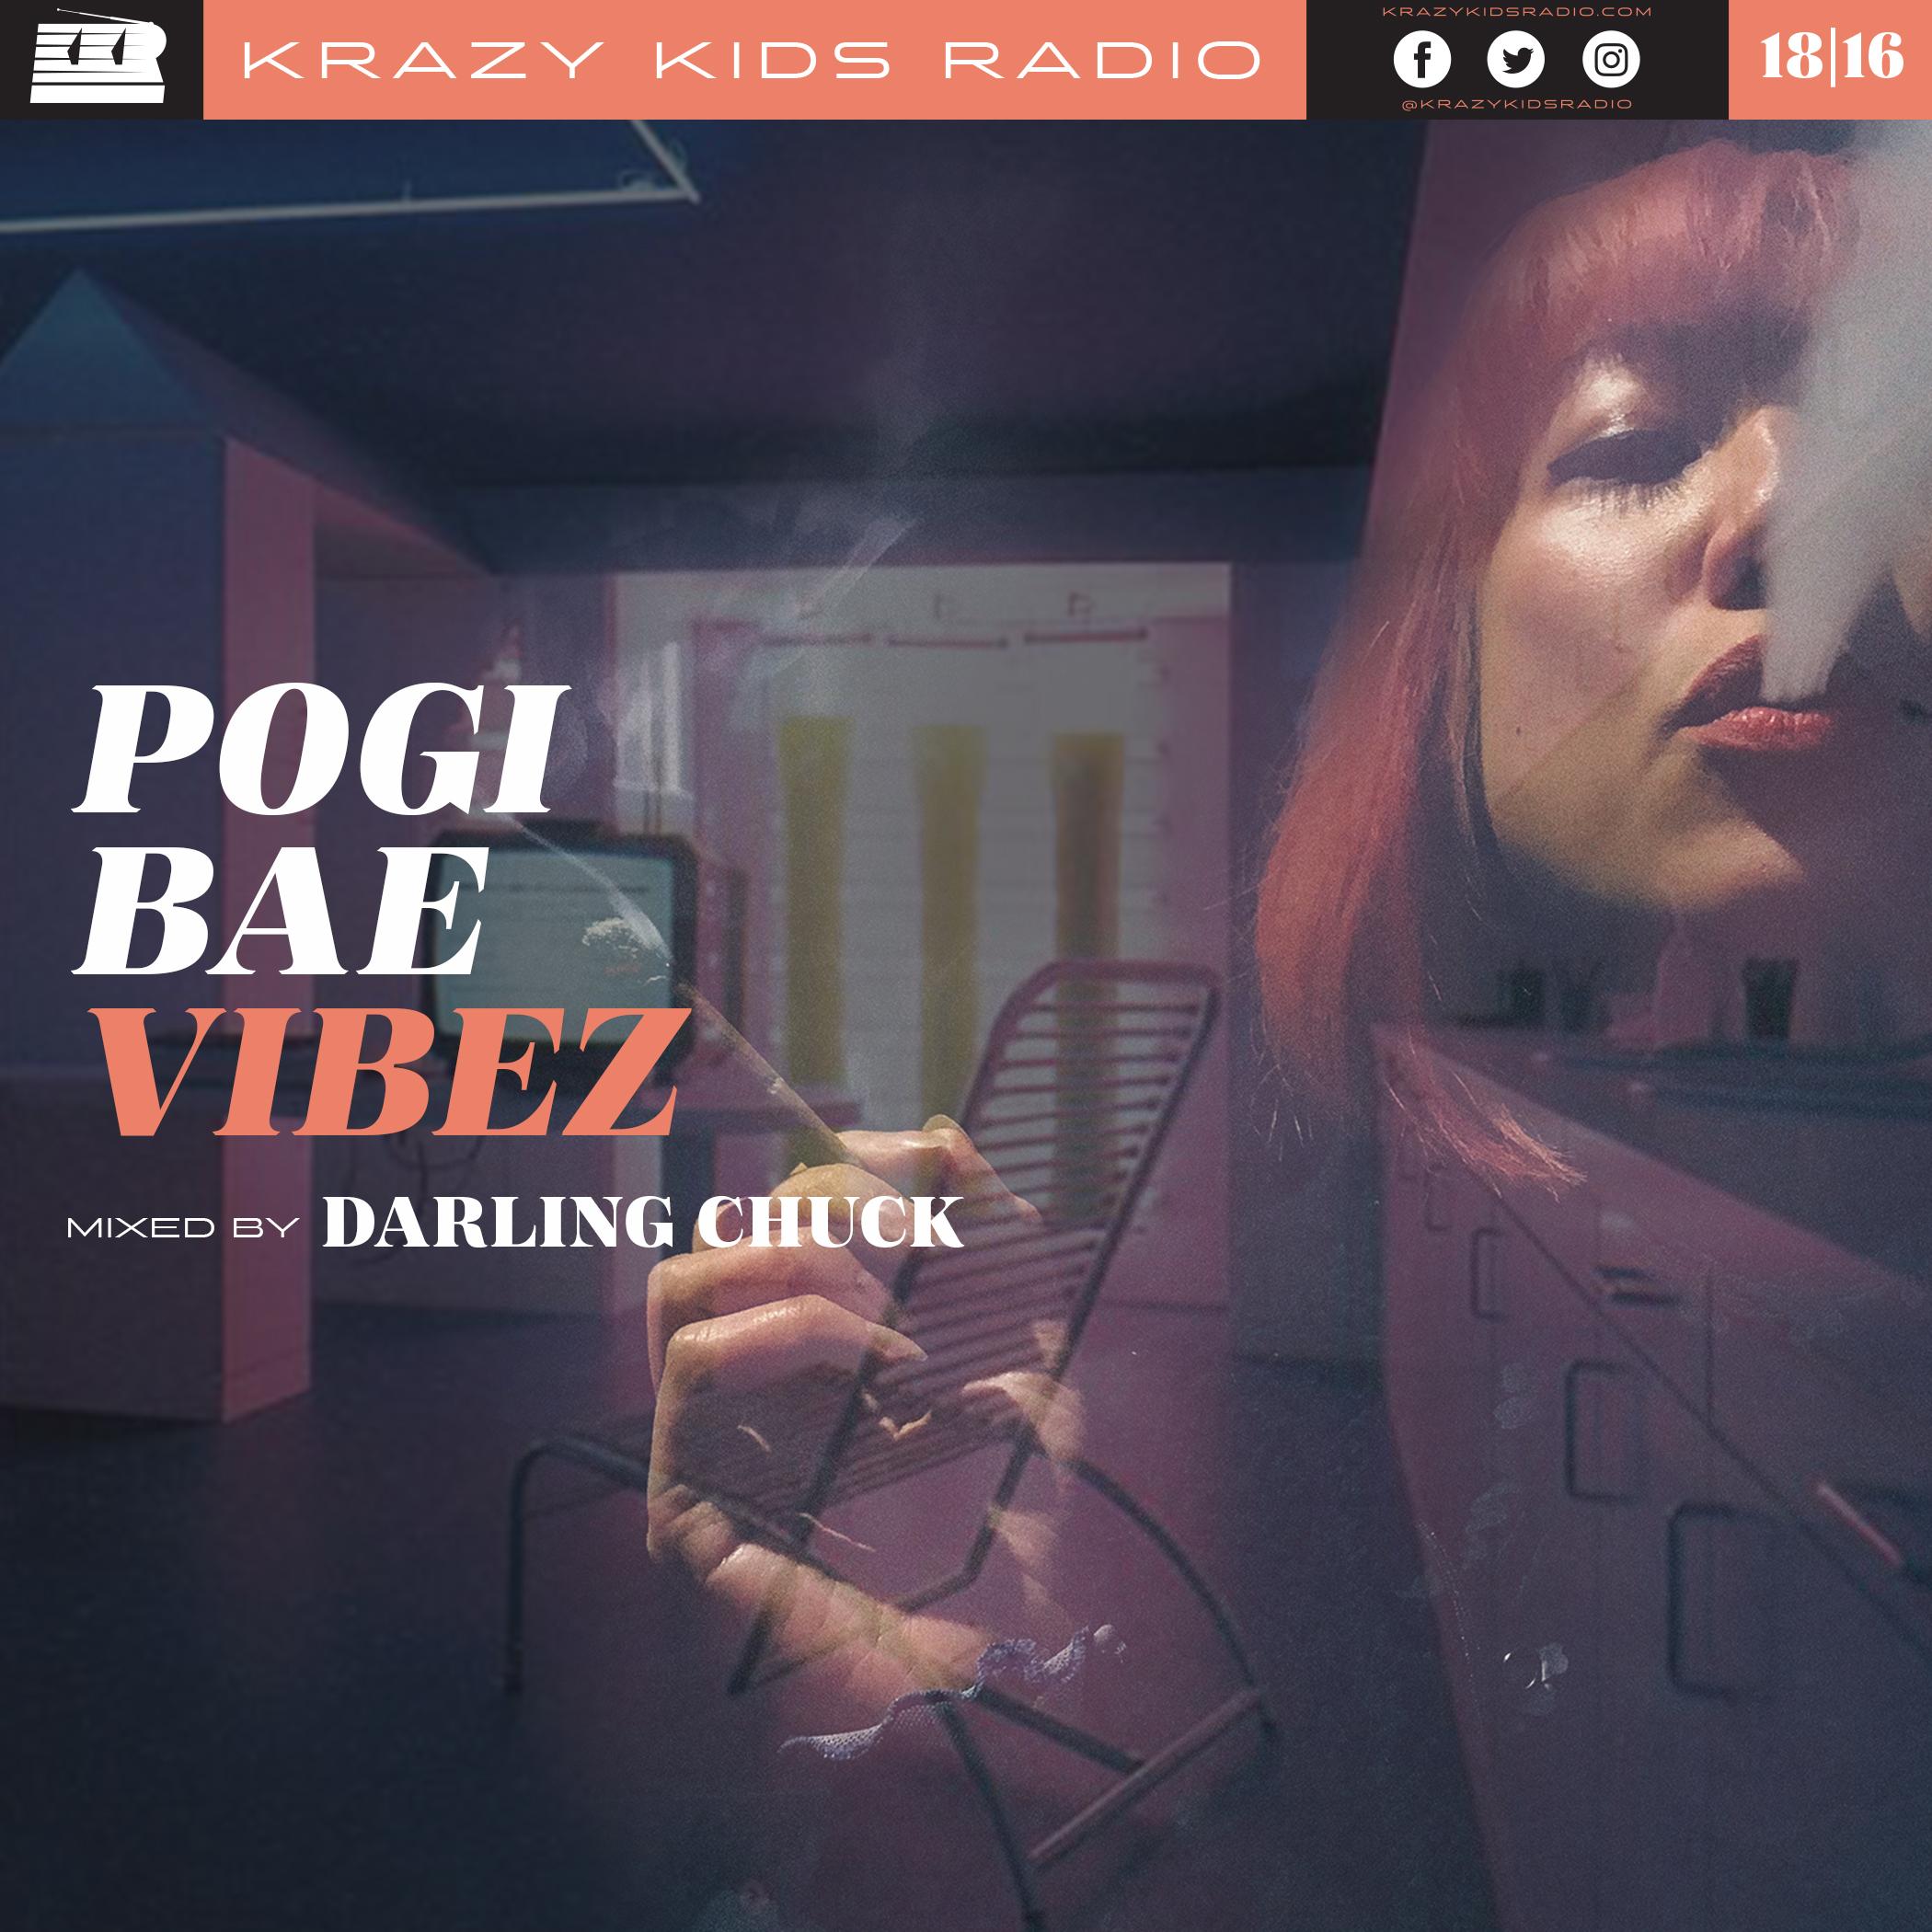 KKR_Pogi-Bae-Vibez.jpg